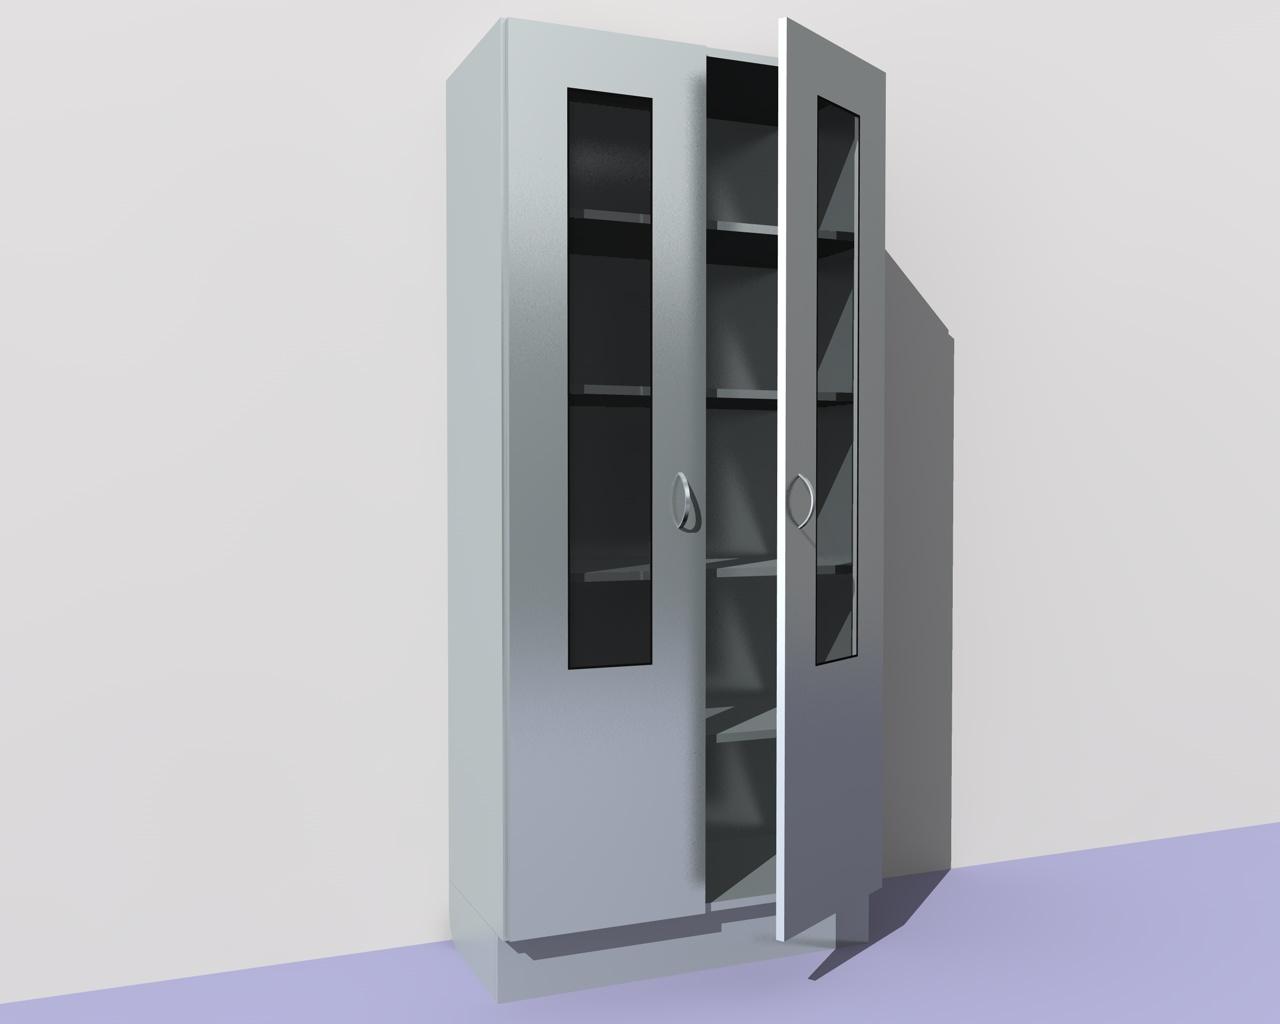 armadio-deposito-sterile